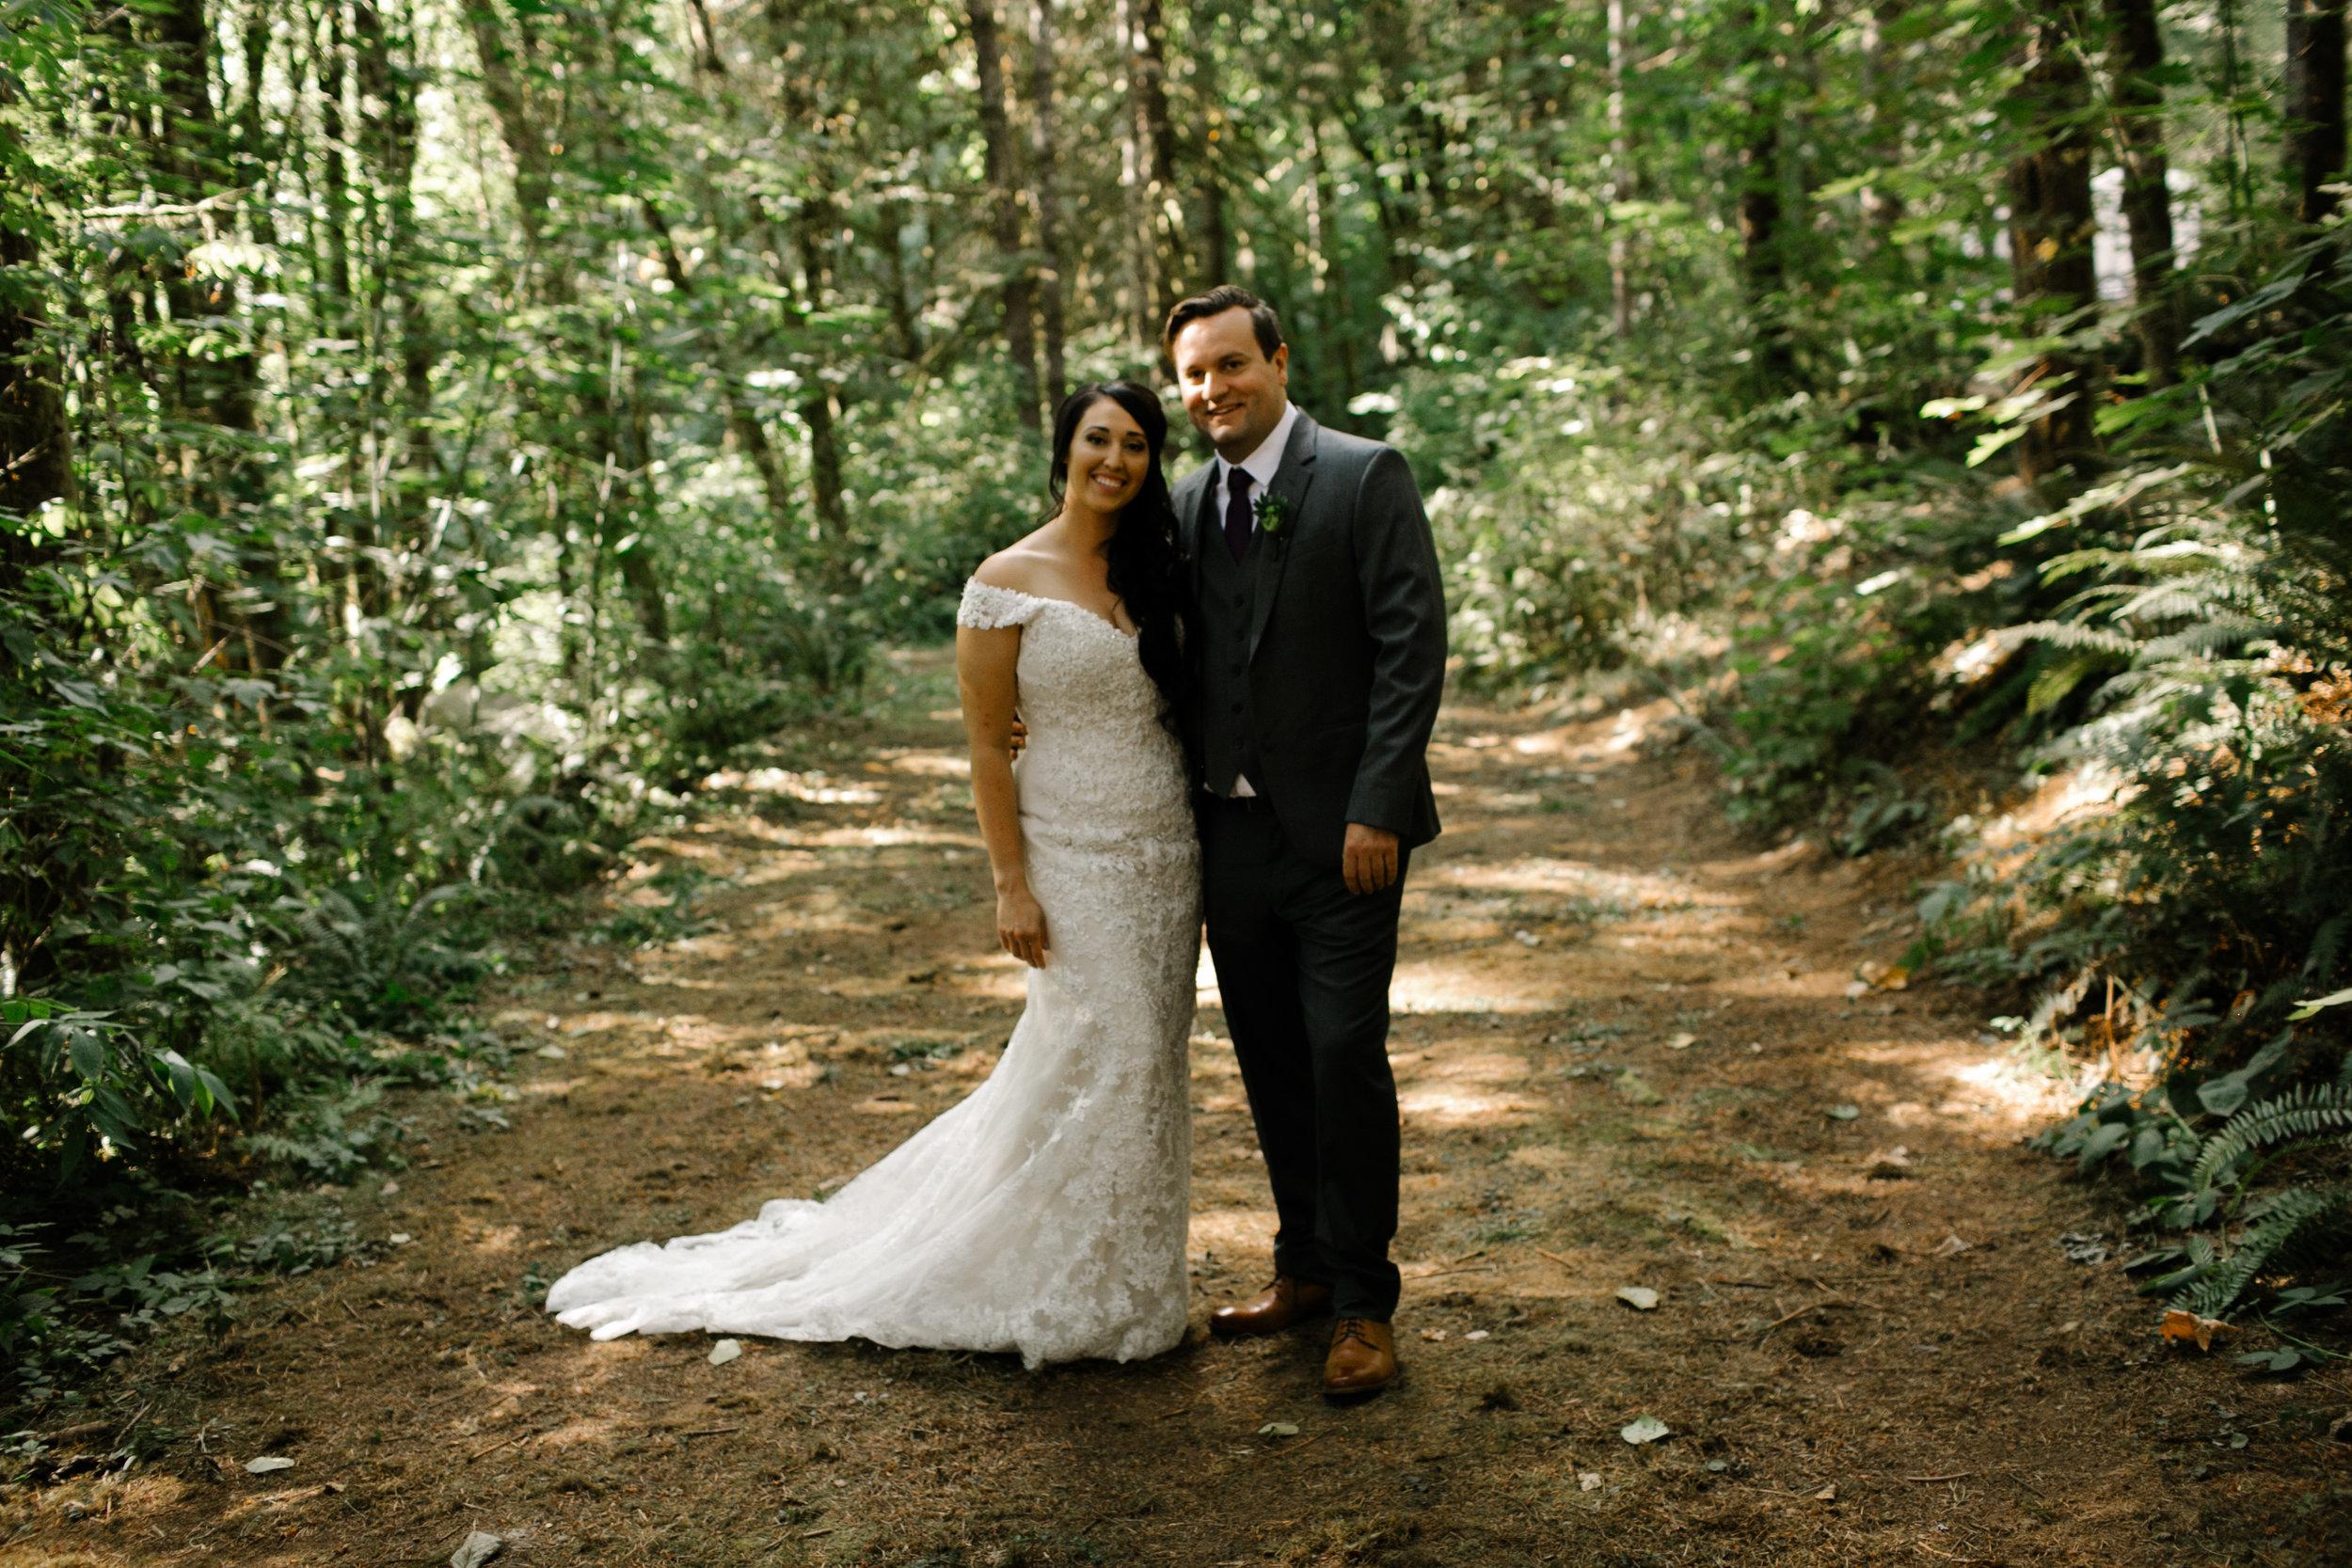 Sevlynn-Photography-Teresa-Chandler-Wedding-15.jpg